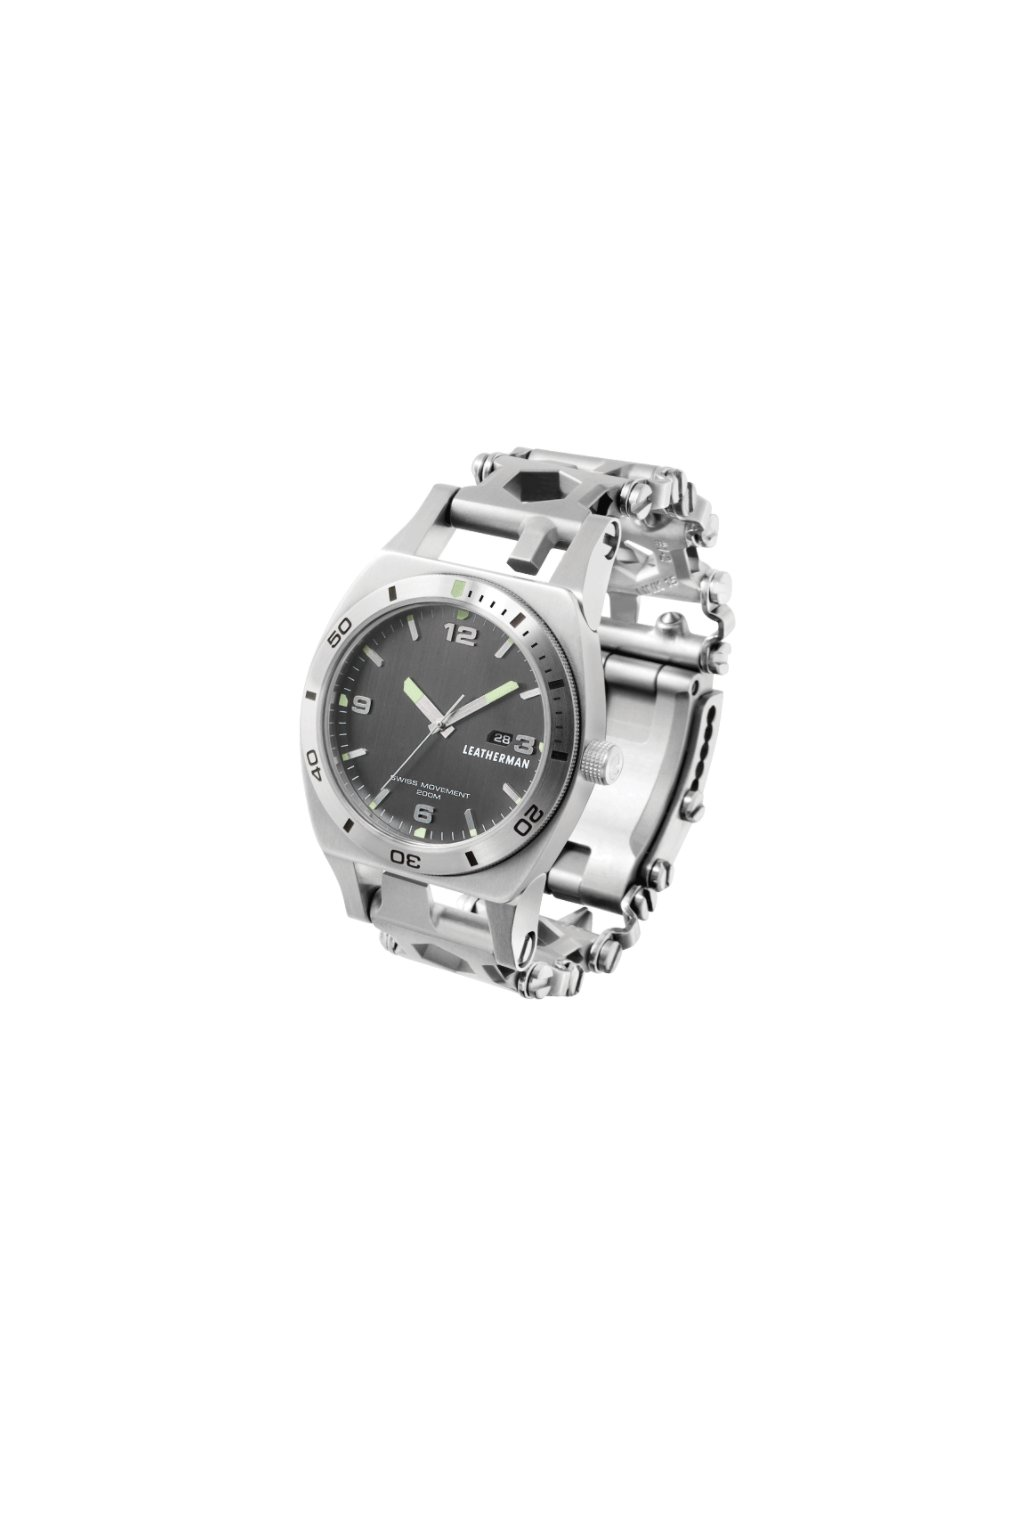 1484 hodinky s multifunkcnimi nastroji tread tempo silver